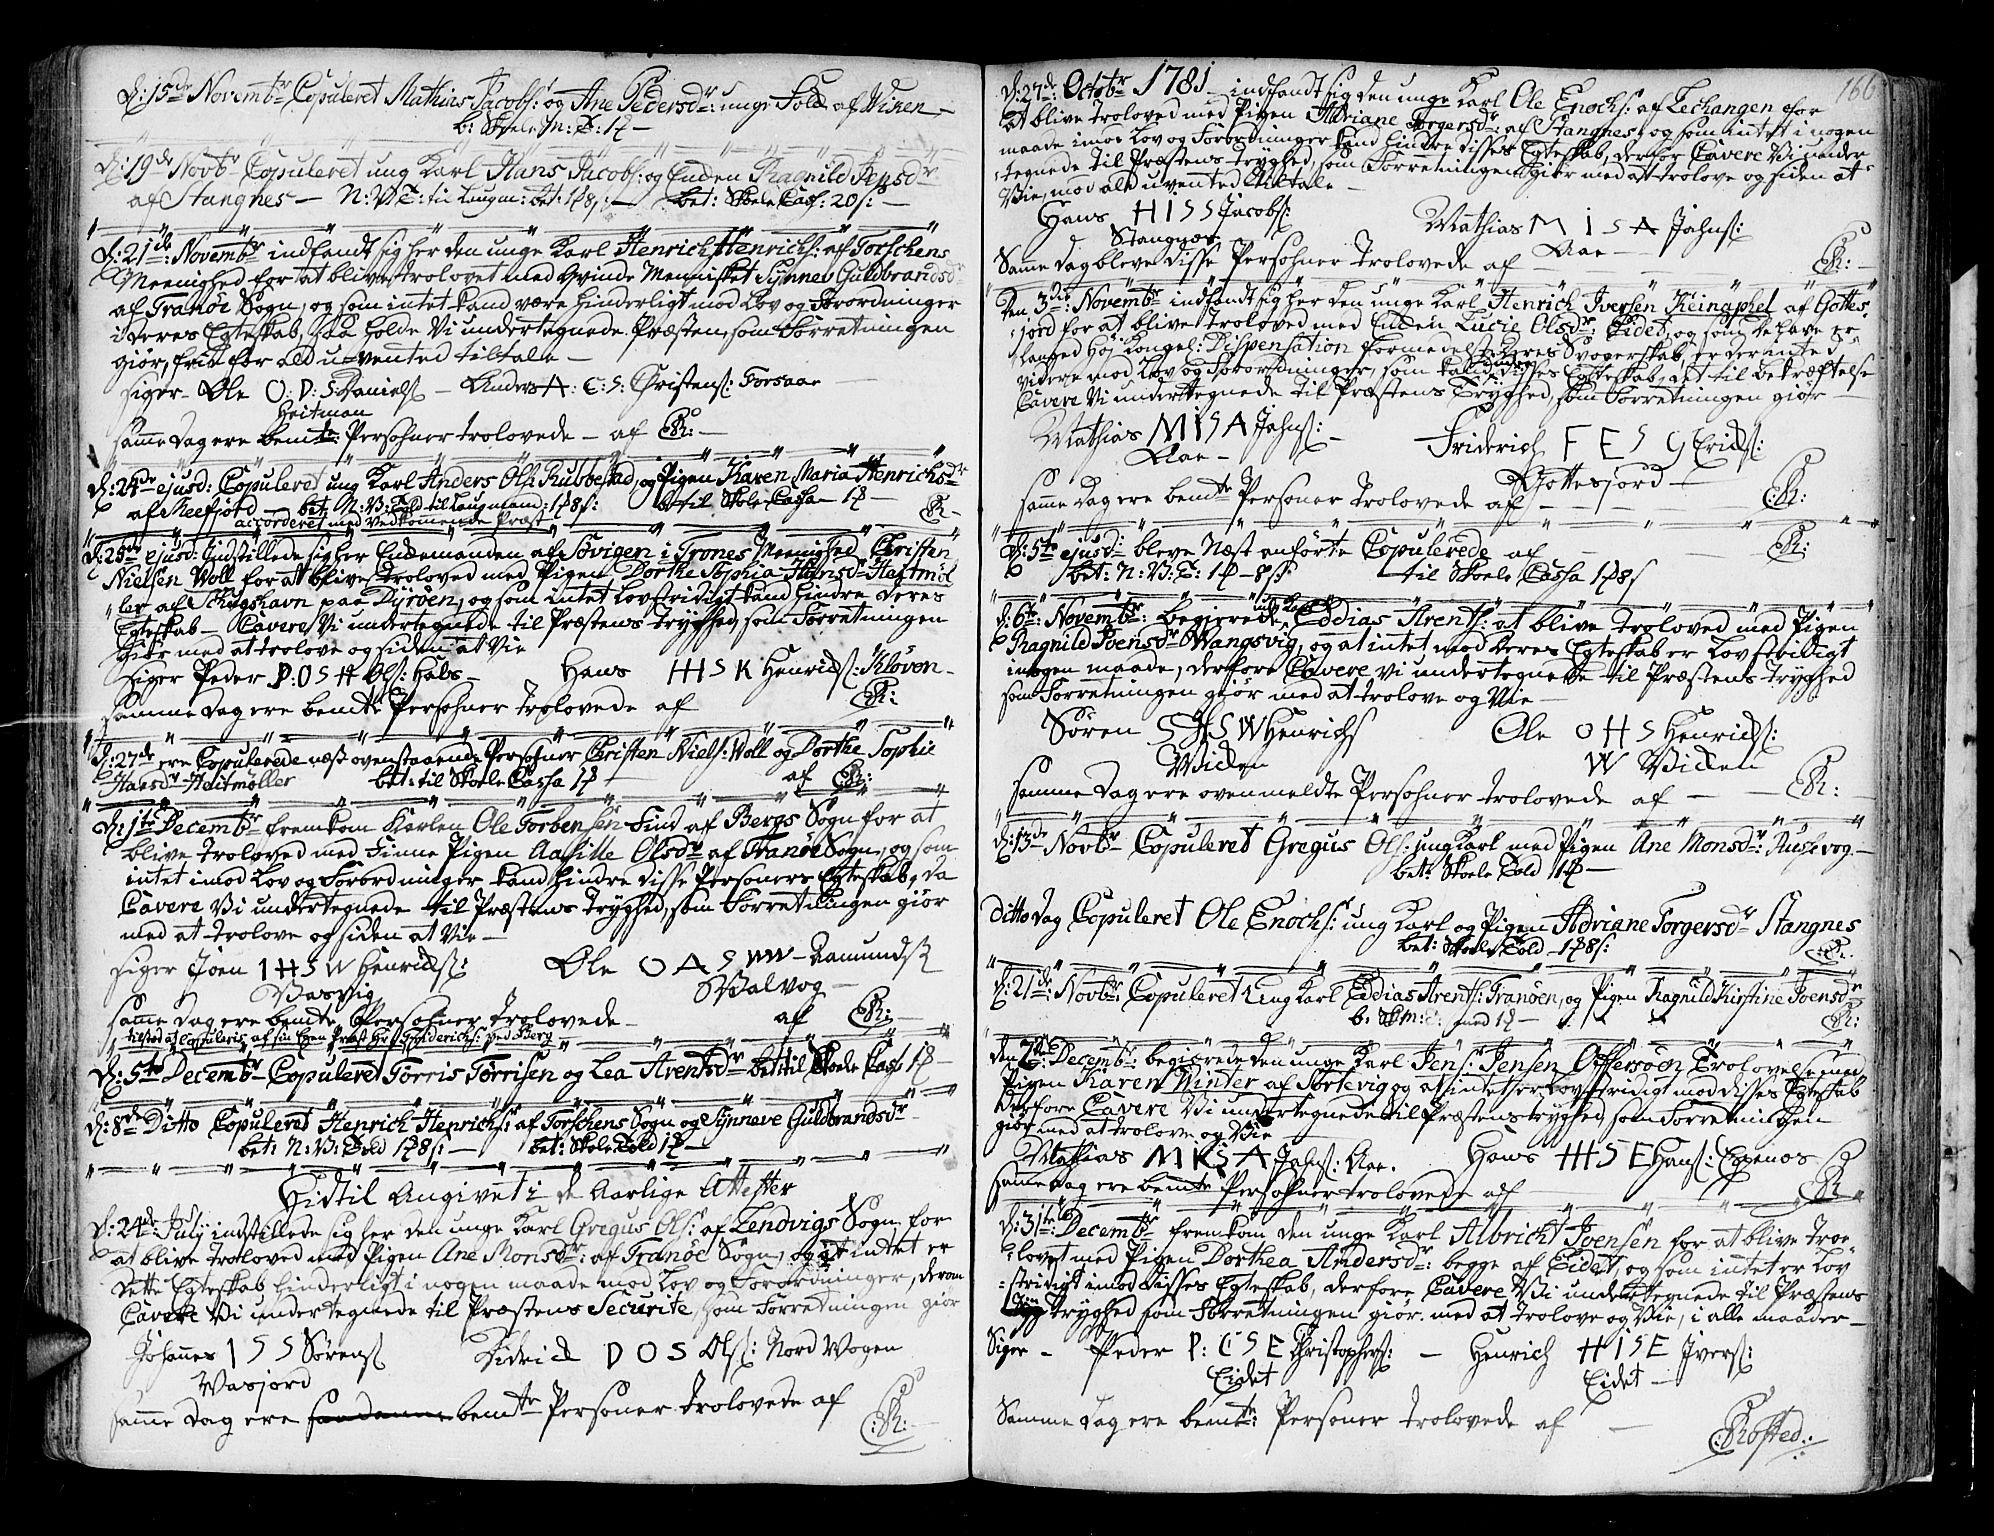 SATØ, Tranøy sokneprestkontor, I/Ia/Iaa/L0002kirke: Ministerialbok nr. 2, 1773-1806, s. 166